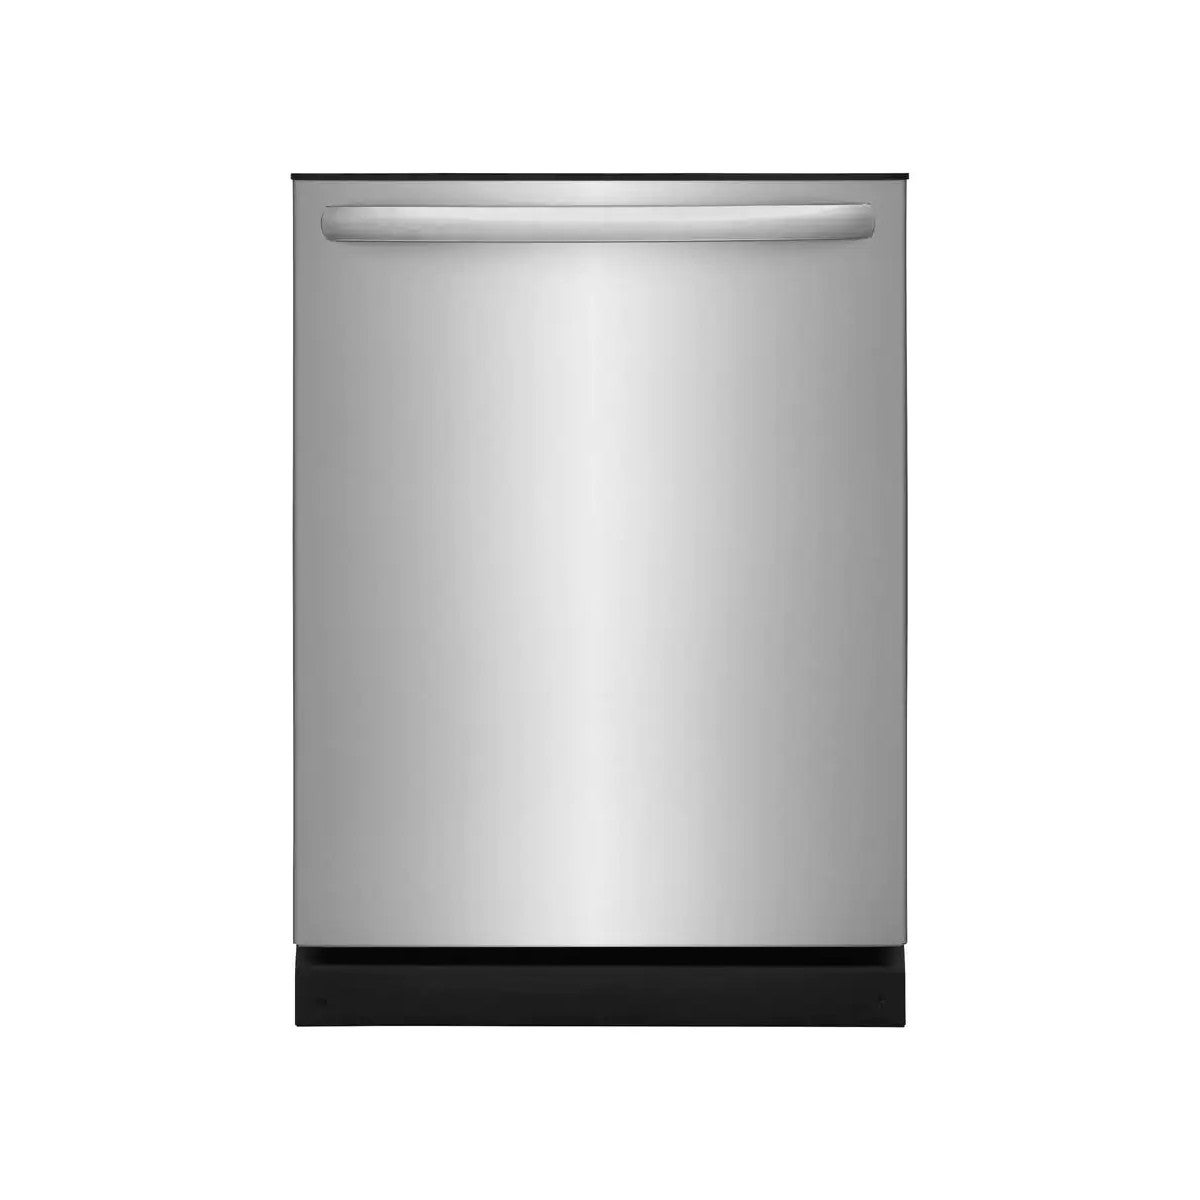 "Best-Dishwashers-Option-Frigidaire-24""-Stainless-Steel-Built-In-Dishwasher"